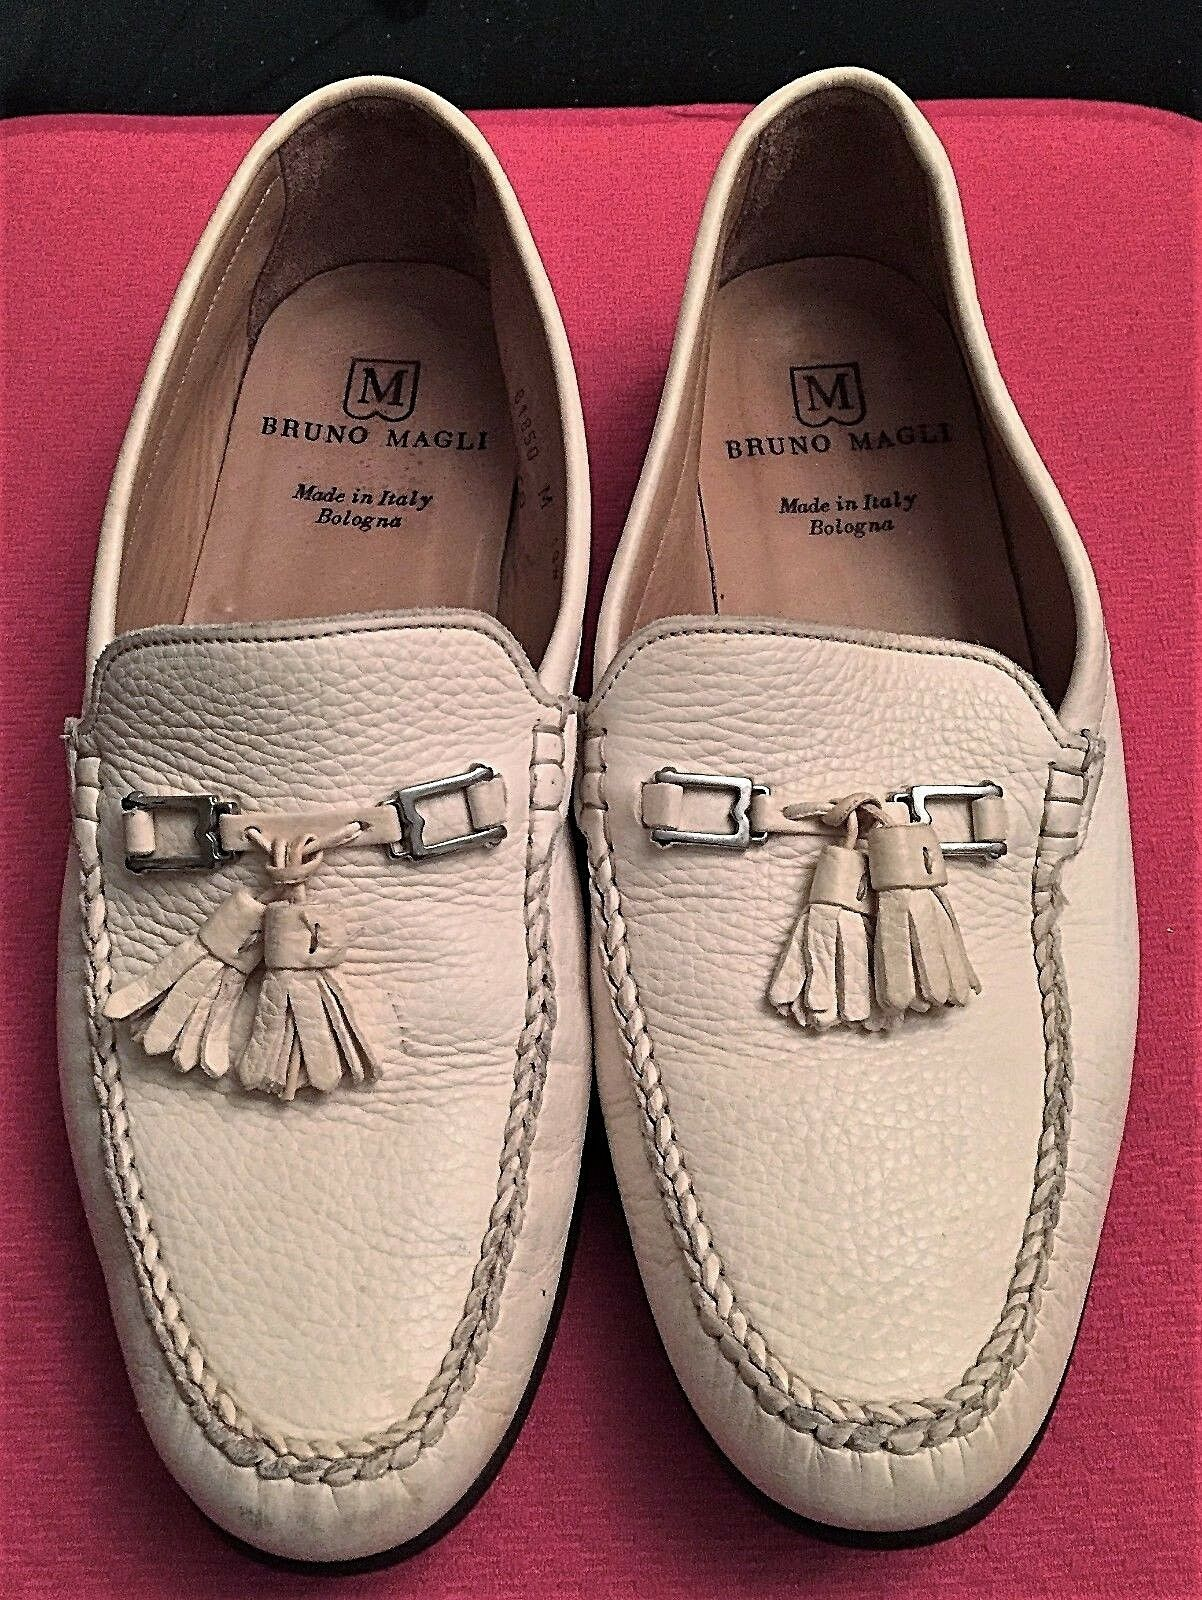 BRUNO MAGLI  FRANCESCO  homme beige veau Mocassin Chaussures Taille 10.5 m Boutique Demos